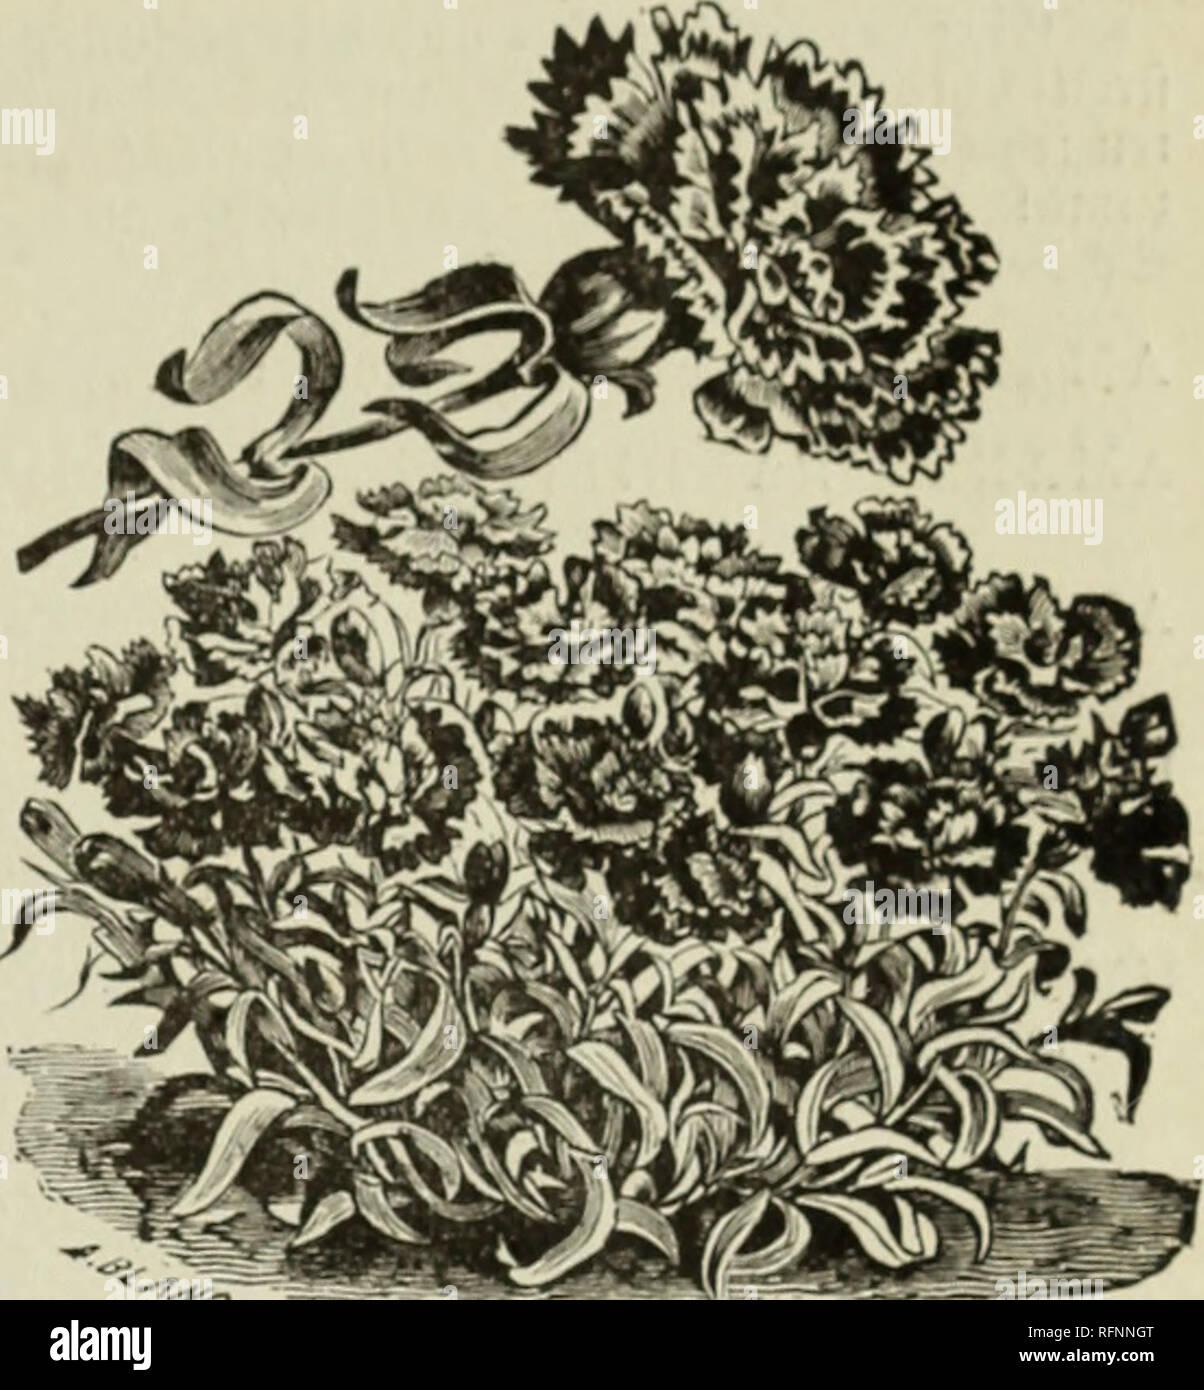 . Seeds. Nursery stock Wisconsin Milwaukee Catalogs; Vegetables Seeds Catalogs; Flowers Seeds Catalogs; Gardening Equipment and supplies Catalogs. SB. Daflttrtg'fl Somen ftntniog. 73. Gfyhtefemttlfe (DIANTHUS.) SDic Nrten bc§ $)iantl)u§ [tub al§ (S^iuefeueire unb japanefifd^c Welfe befauut nub geb,6ieu jtt ben btiQiatK teften ©mtenblumen. 28ei§ mit votb, gejiretft. sJt o t b, in i t to e i f3 g e ft r e i f t. $) u n f e l b i u t r o 11). (5 r t r a g e f ii 111 e, f d) 6 n g e ^ e i d) u e t, m e i   . $ev ^acfet 5c, llu$e 3()c gttoettrigisftelfett* (tftnfadK-) EASTERN QUEEN, feb,r ejjeftool Stock Photo